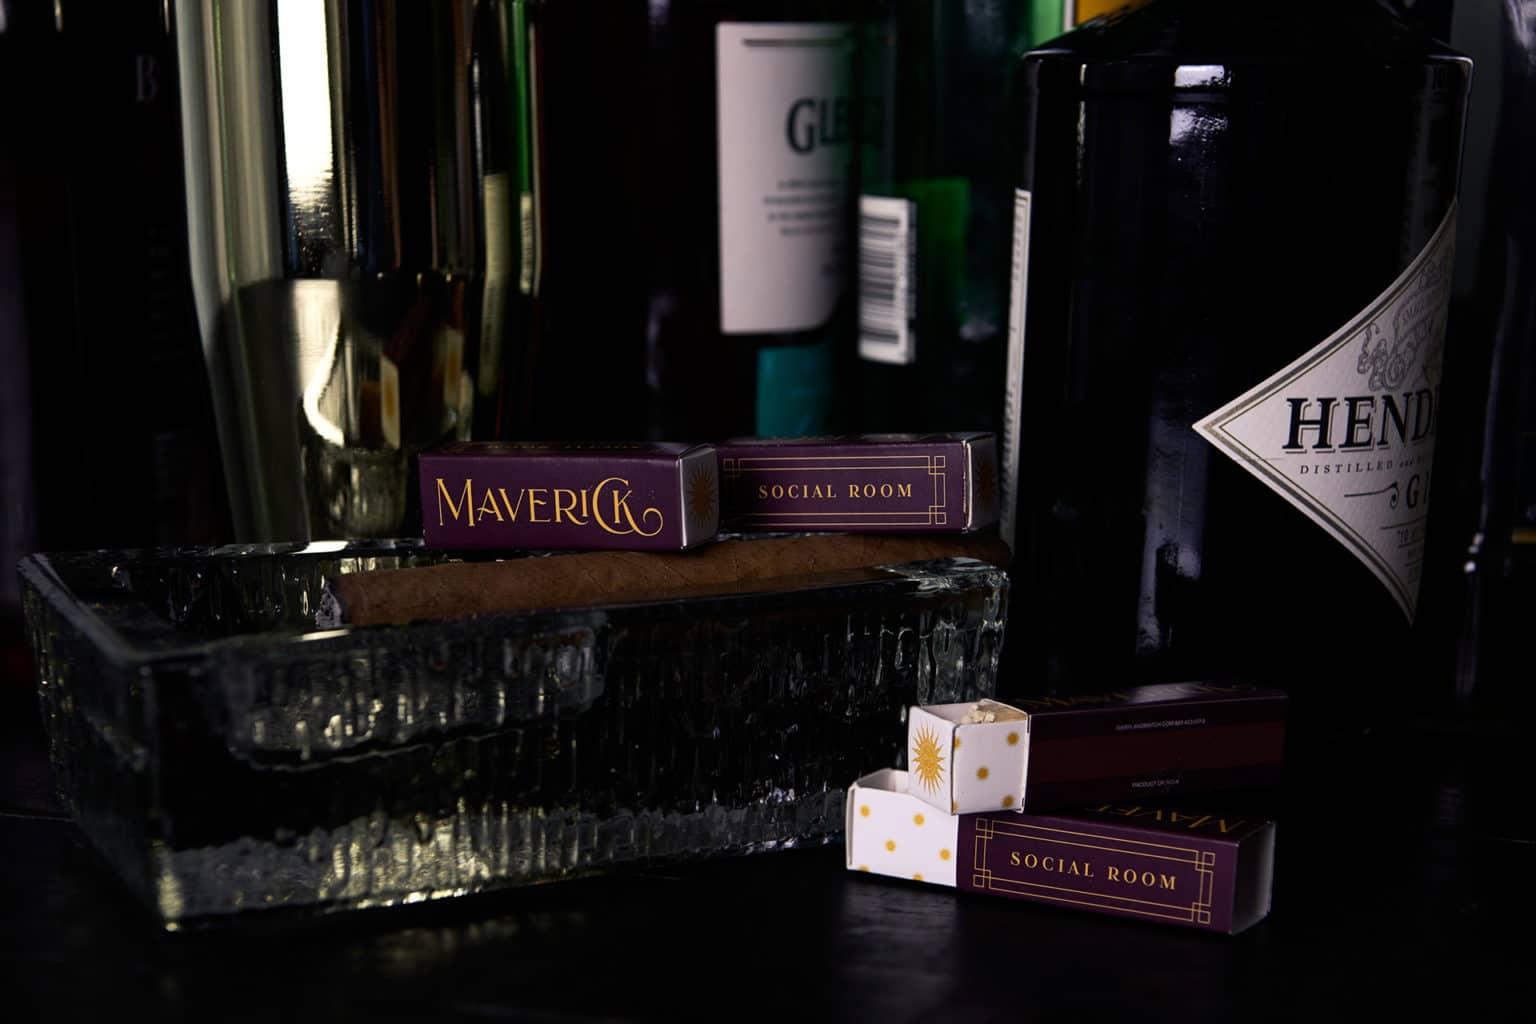 Maverick bar restaurant branding and concept development in Atlanta, Georgia